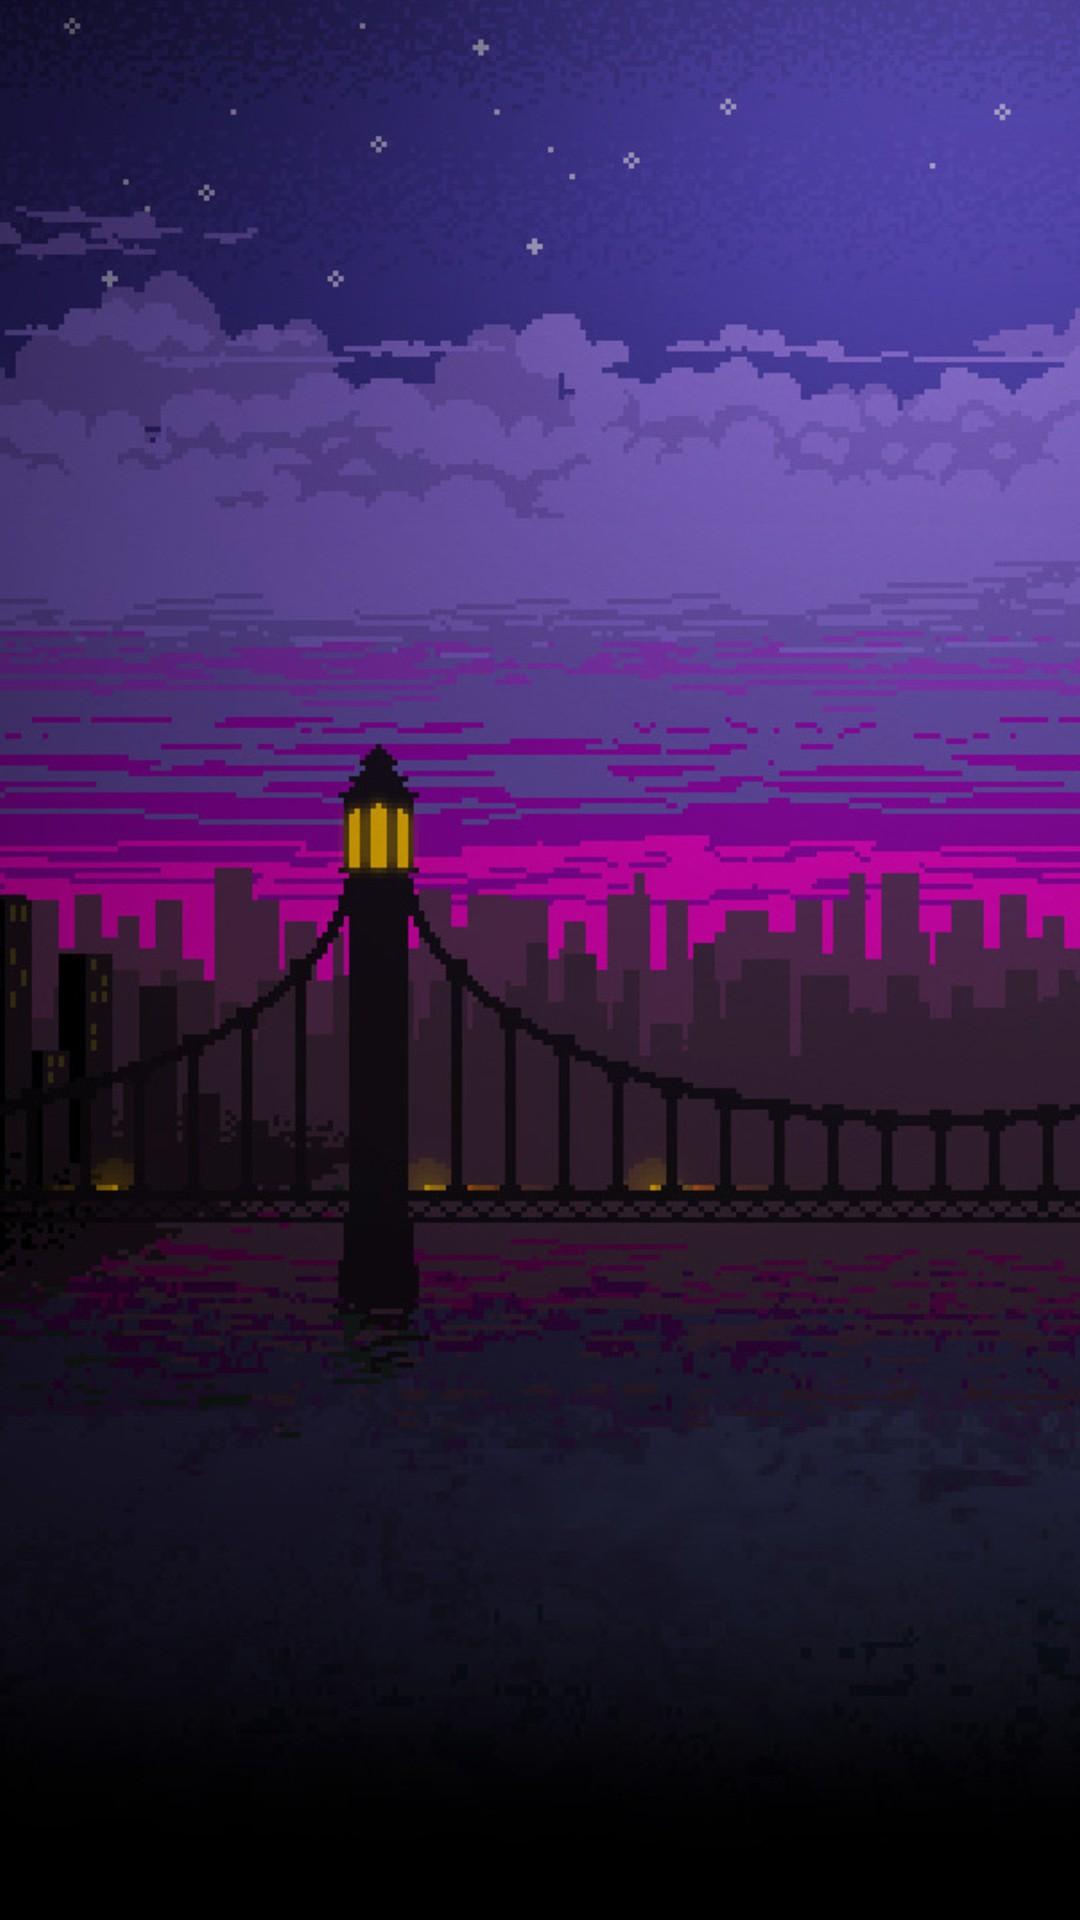 Pixel Art Bridge Night Cc Wallpaper - [1080x1920]